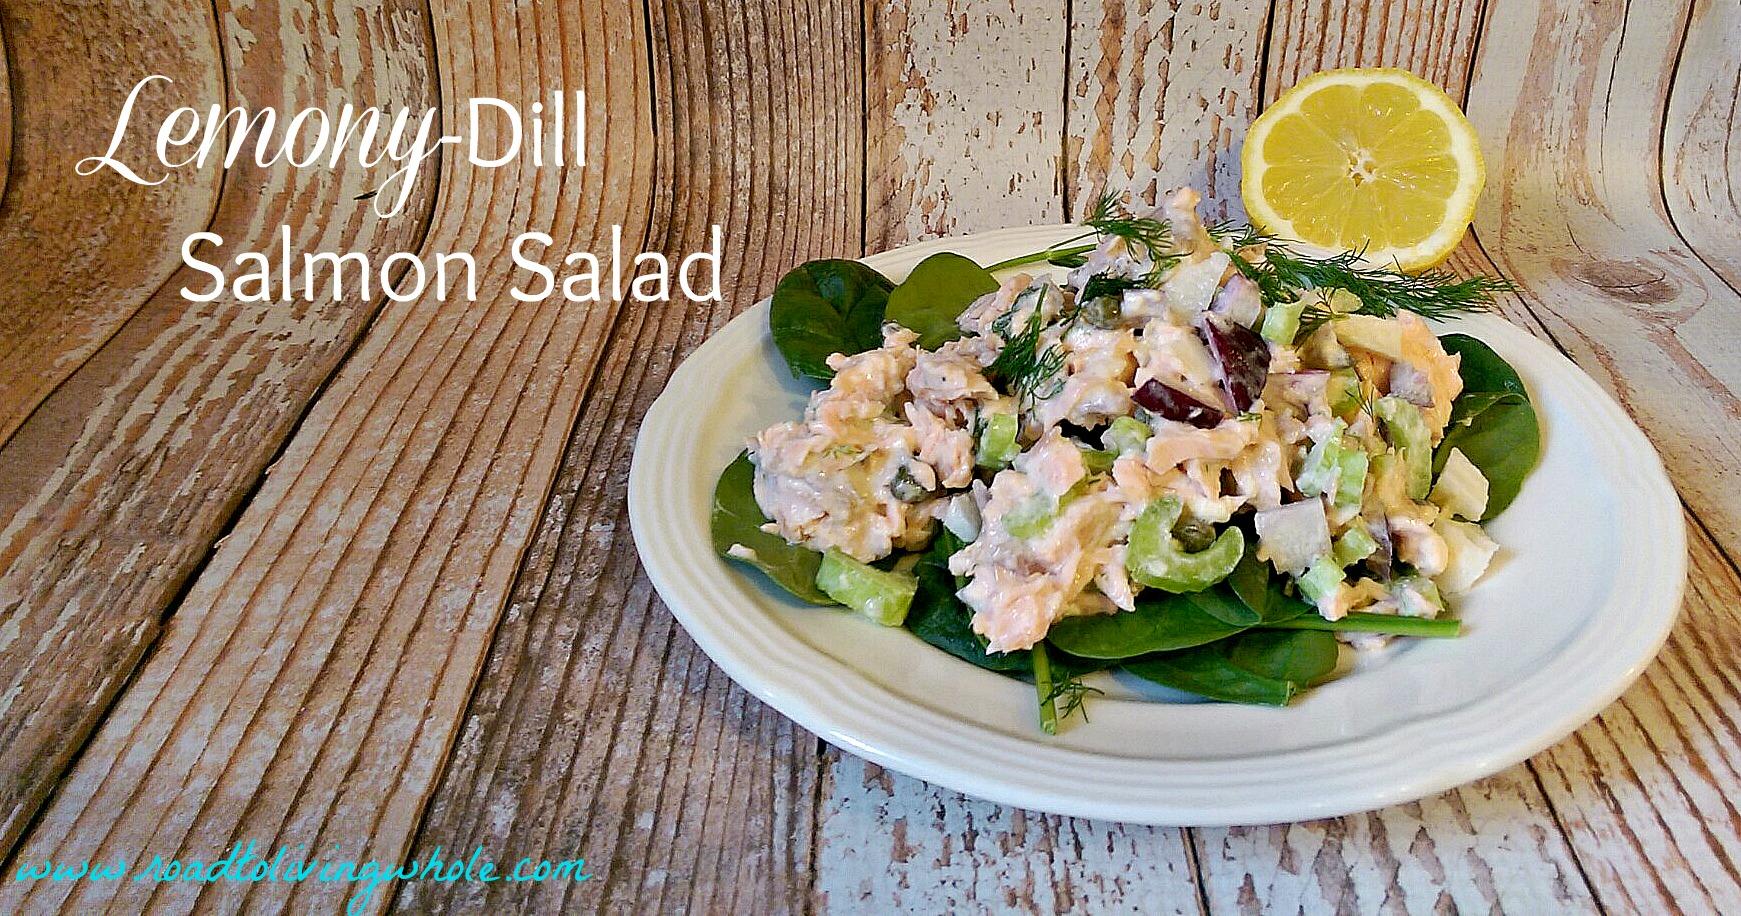 gluten free paleo grain free lemon dill salmon salad